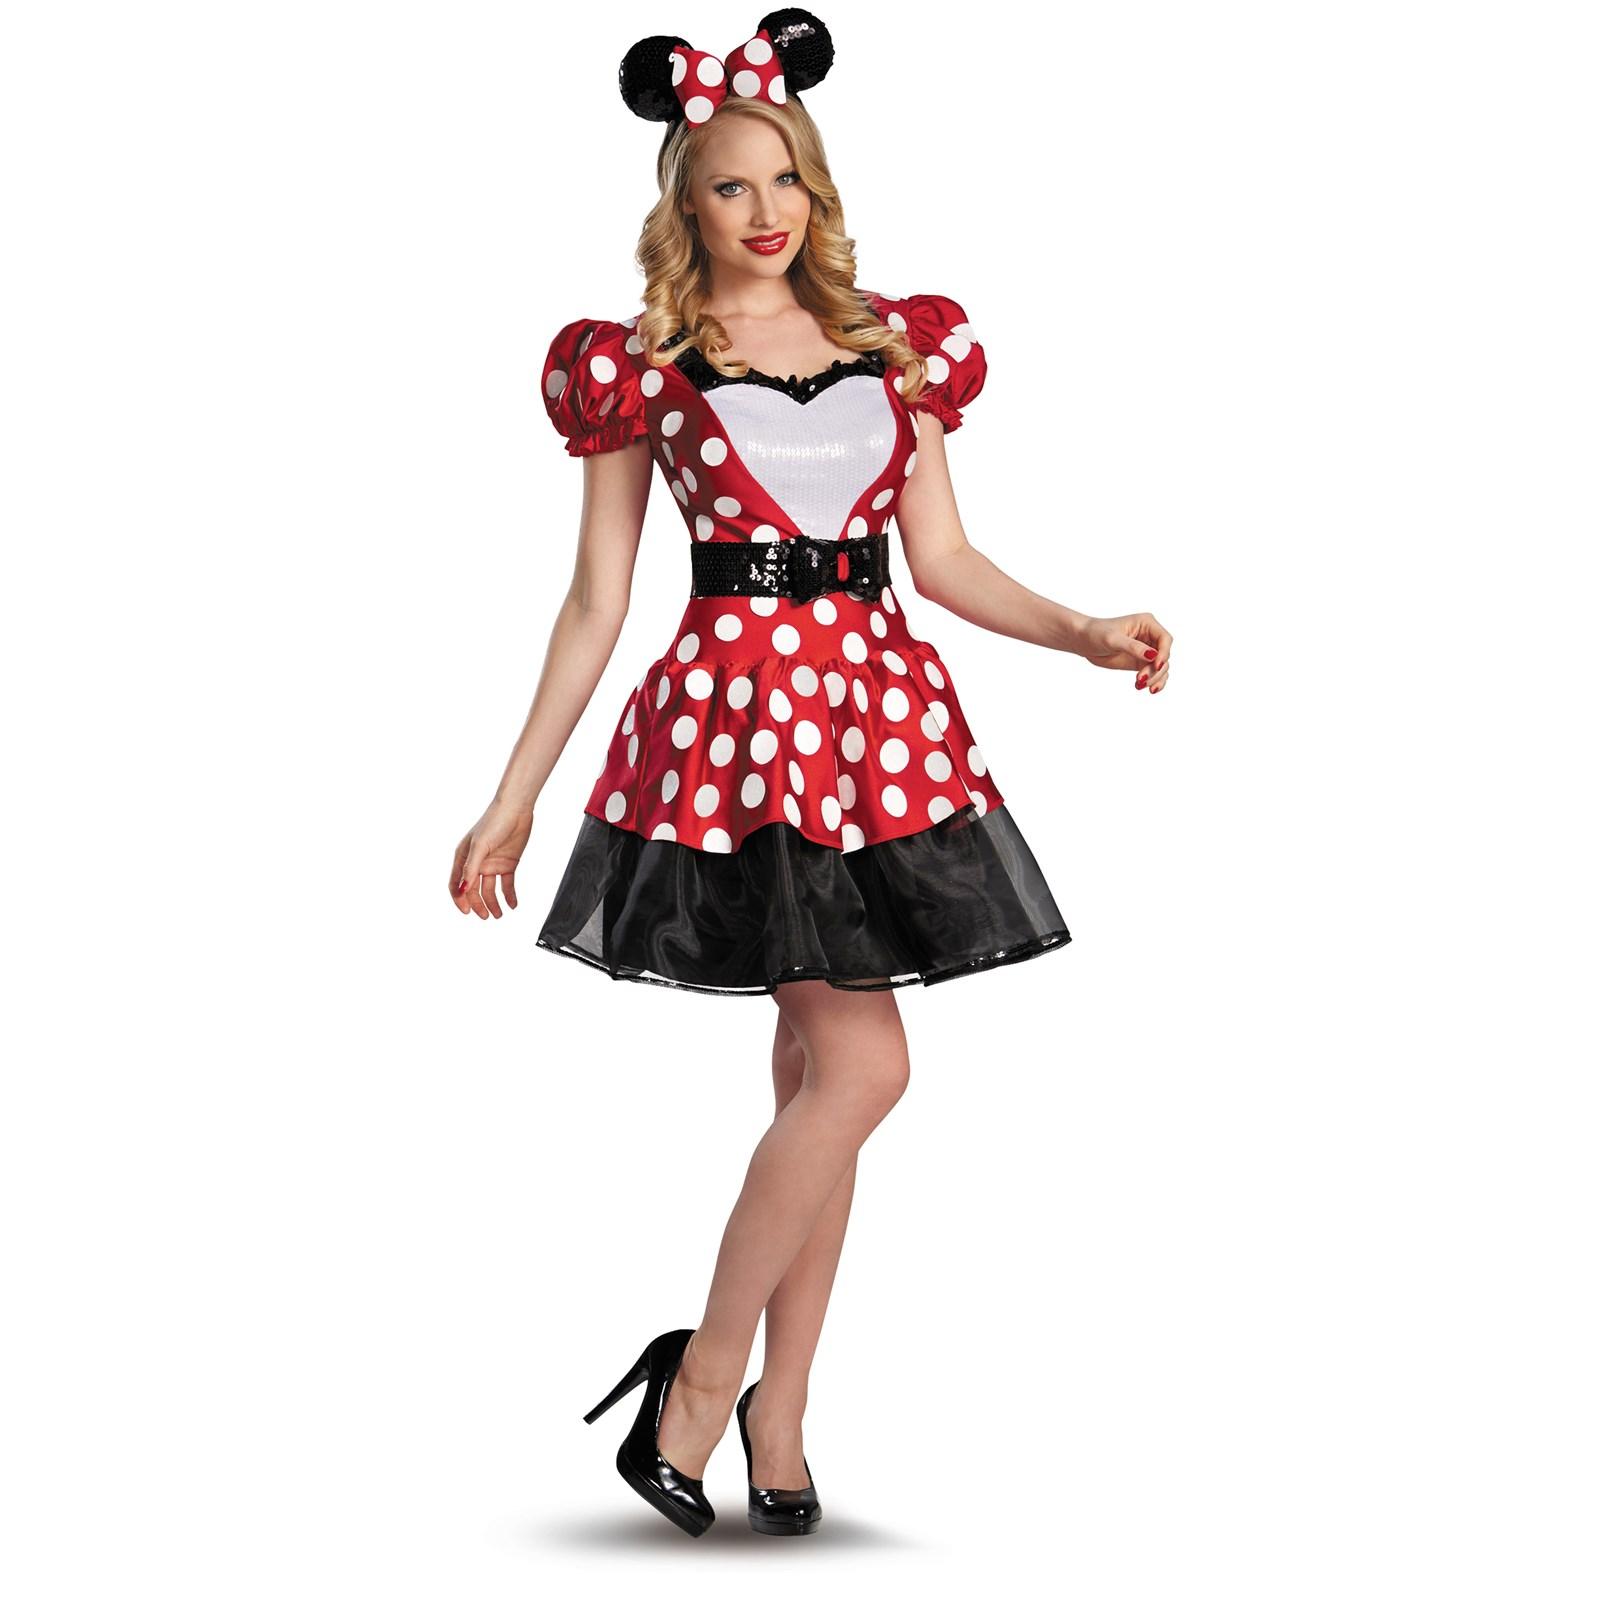 Red Minnie Glam Costume | BuyCostumes.com